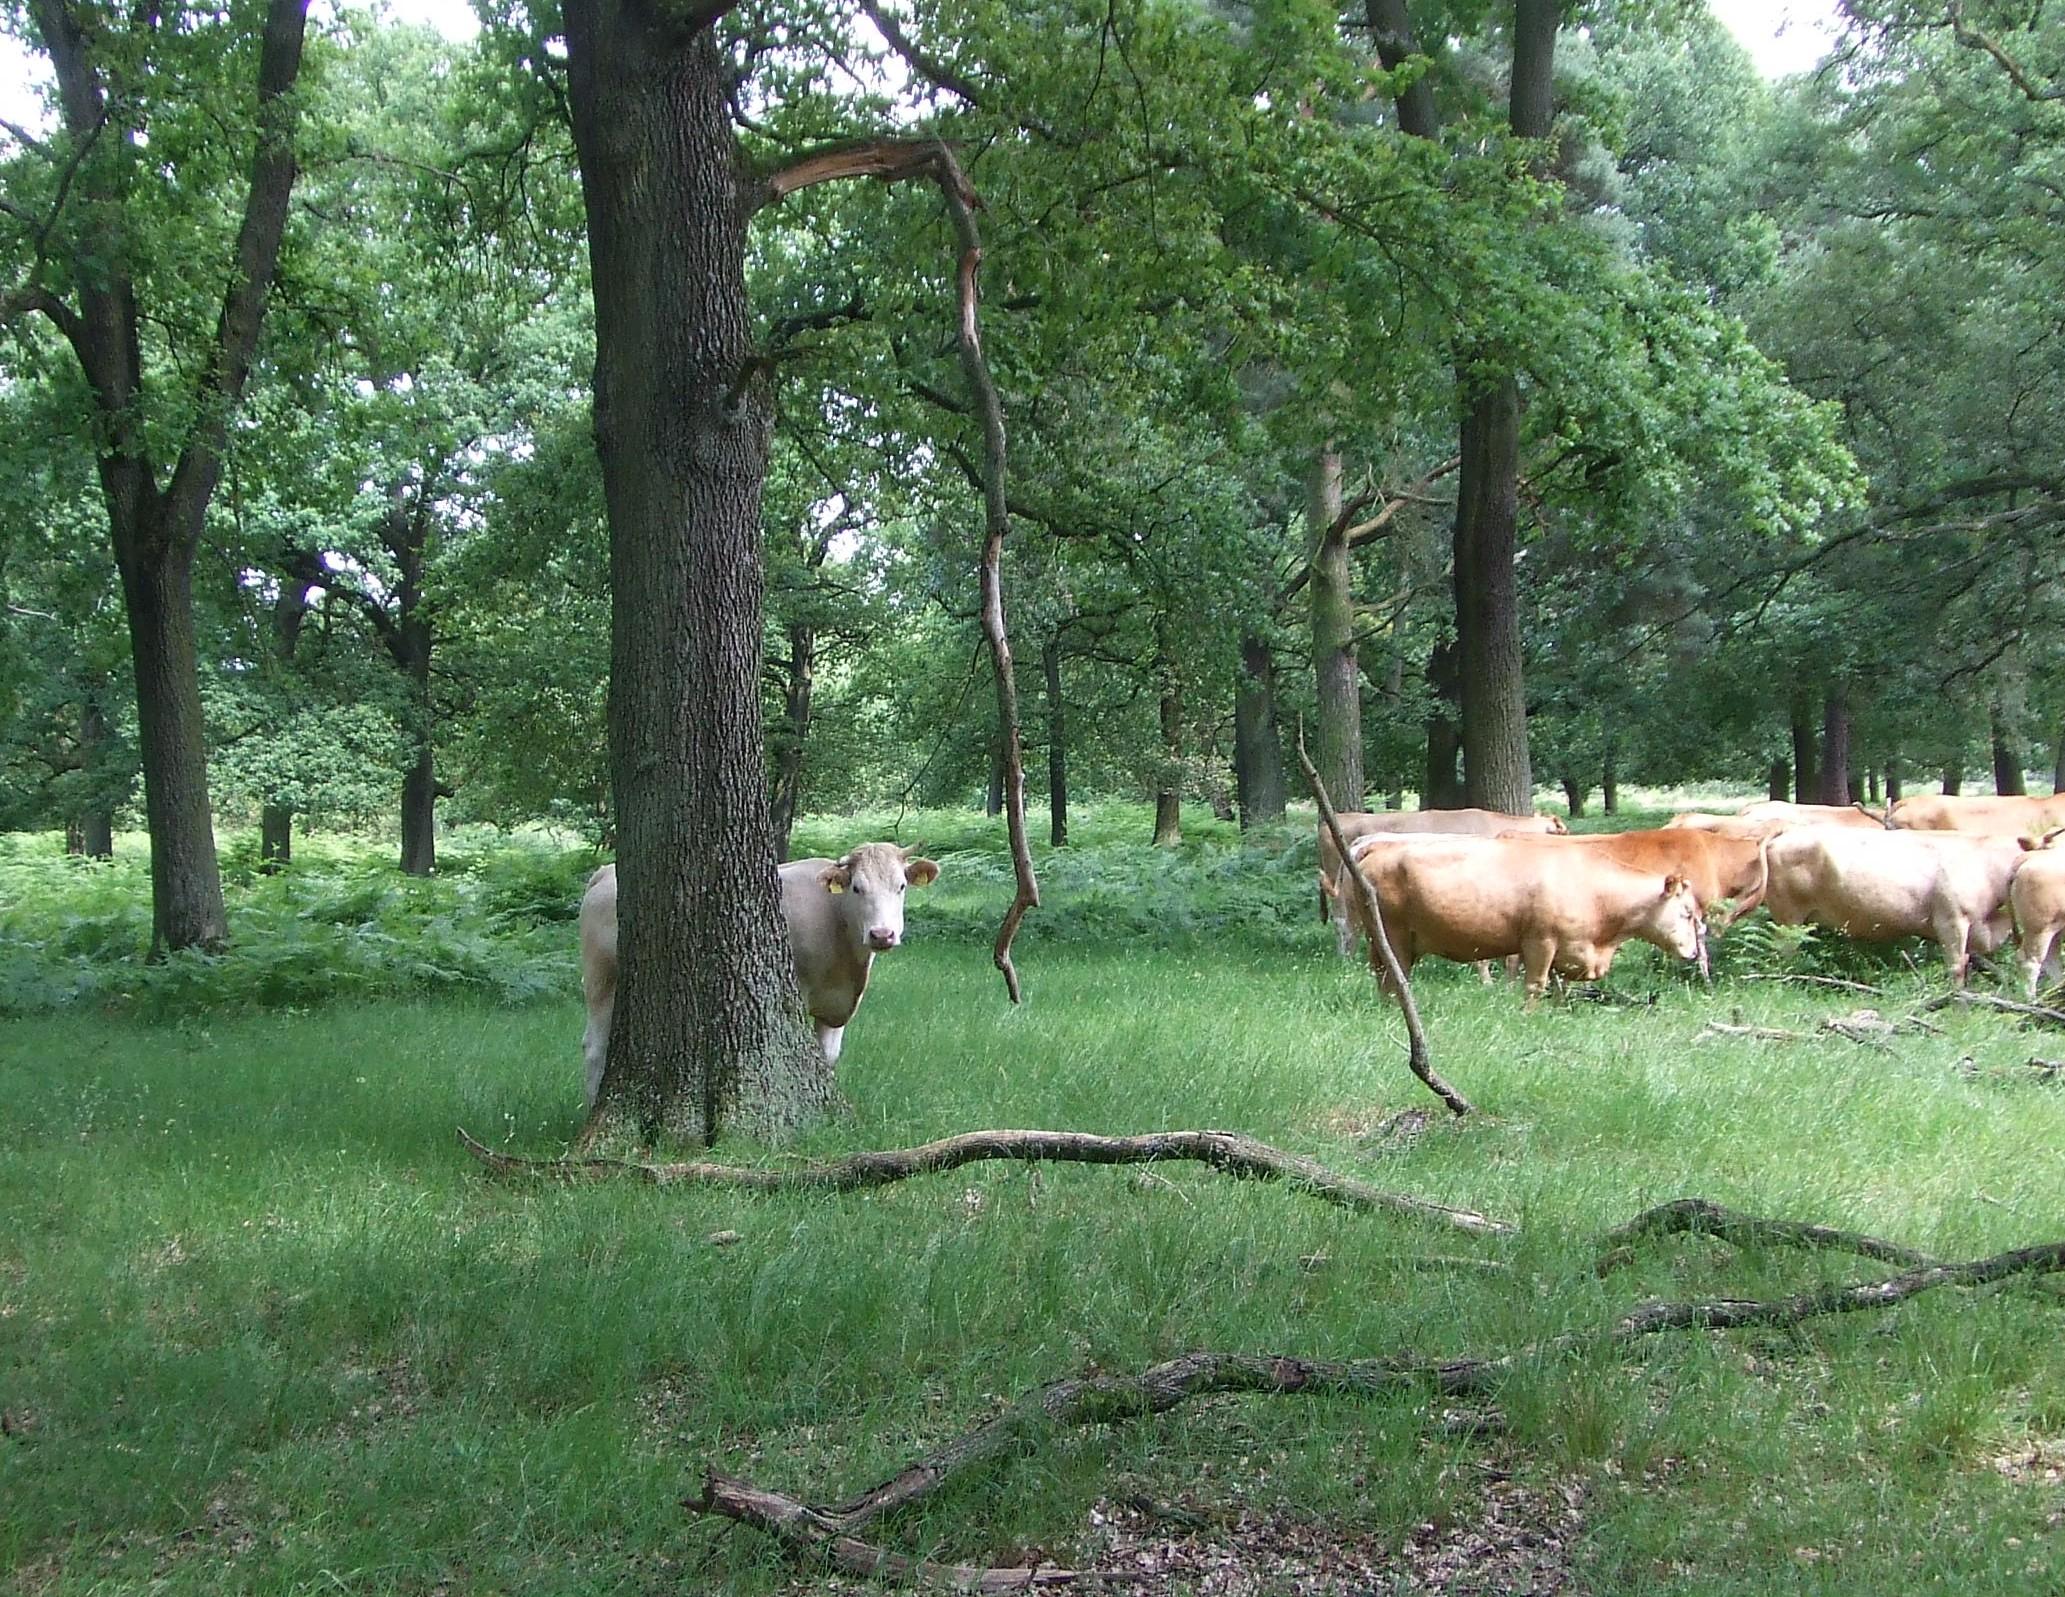 Rinder im Hudewald